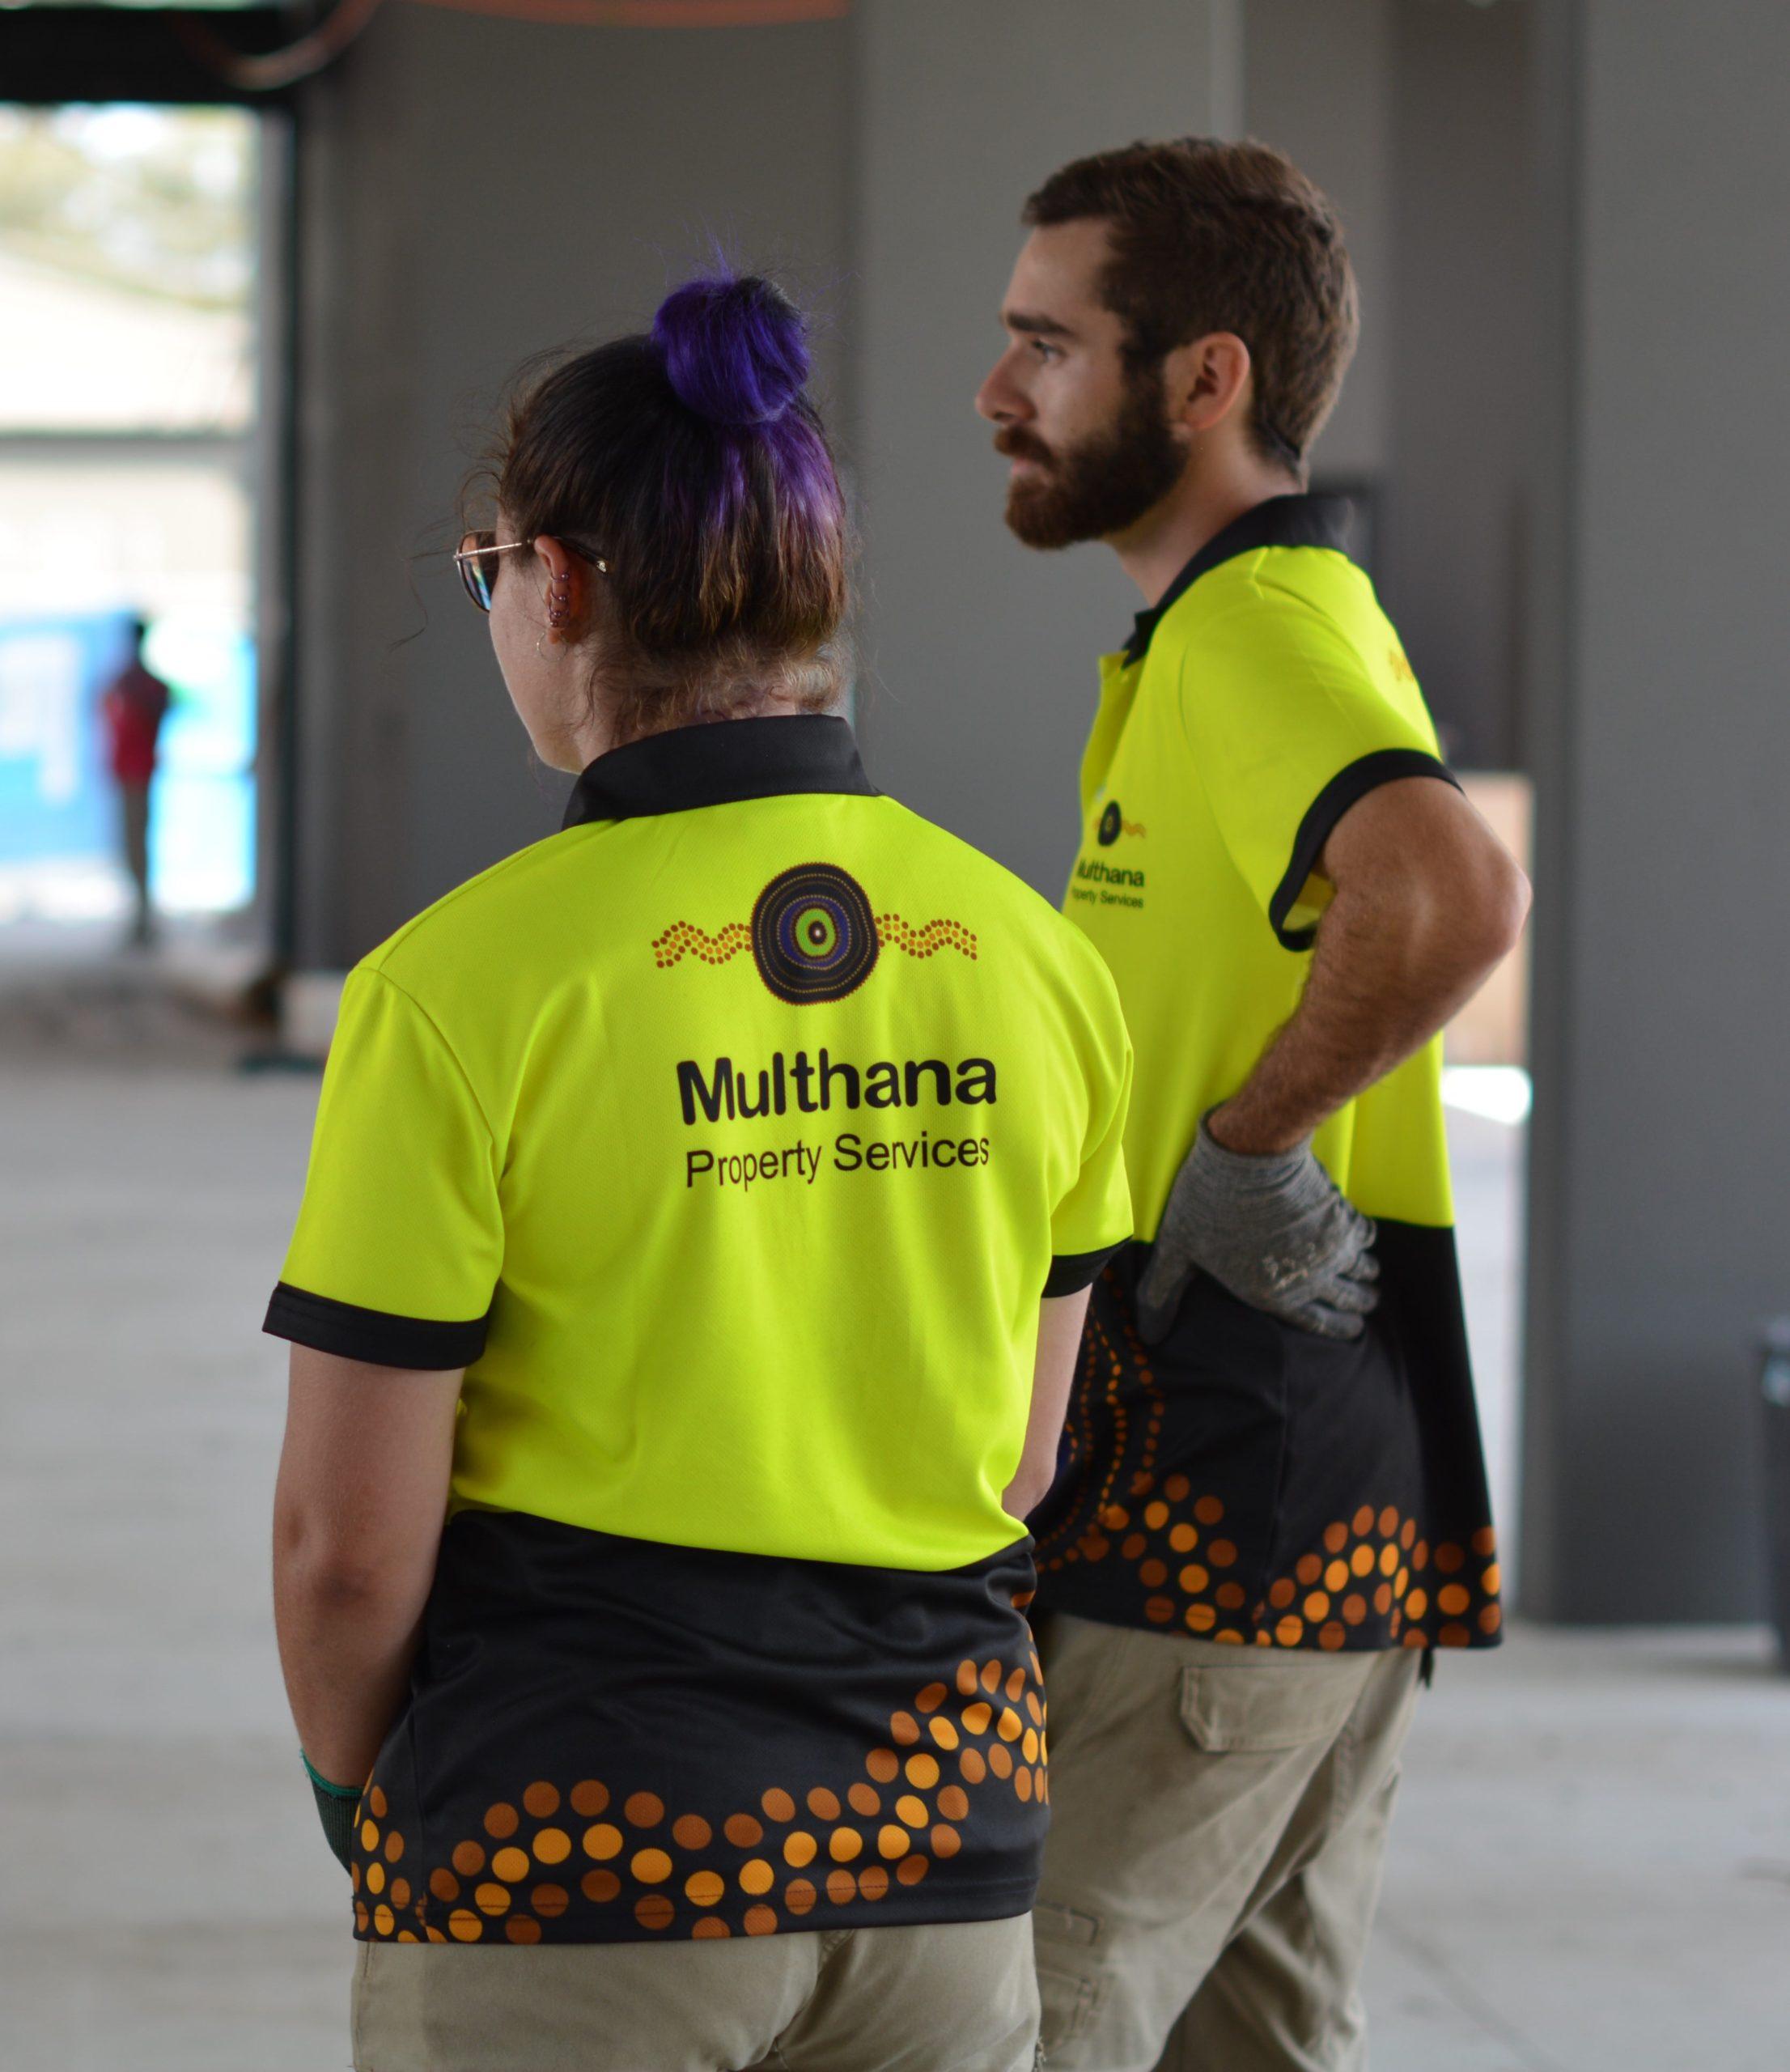 Multhana Property Services - Brisbane City Council - Bus Sanitisation